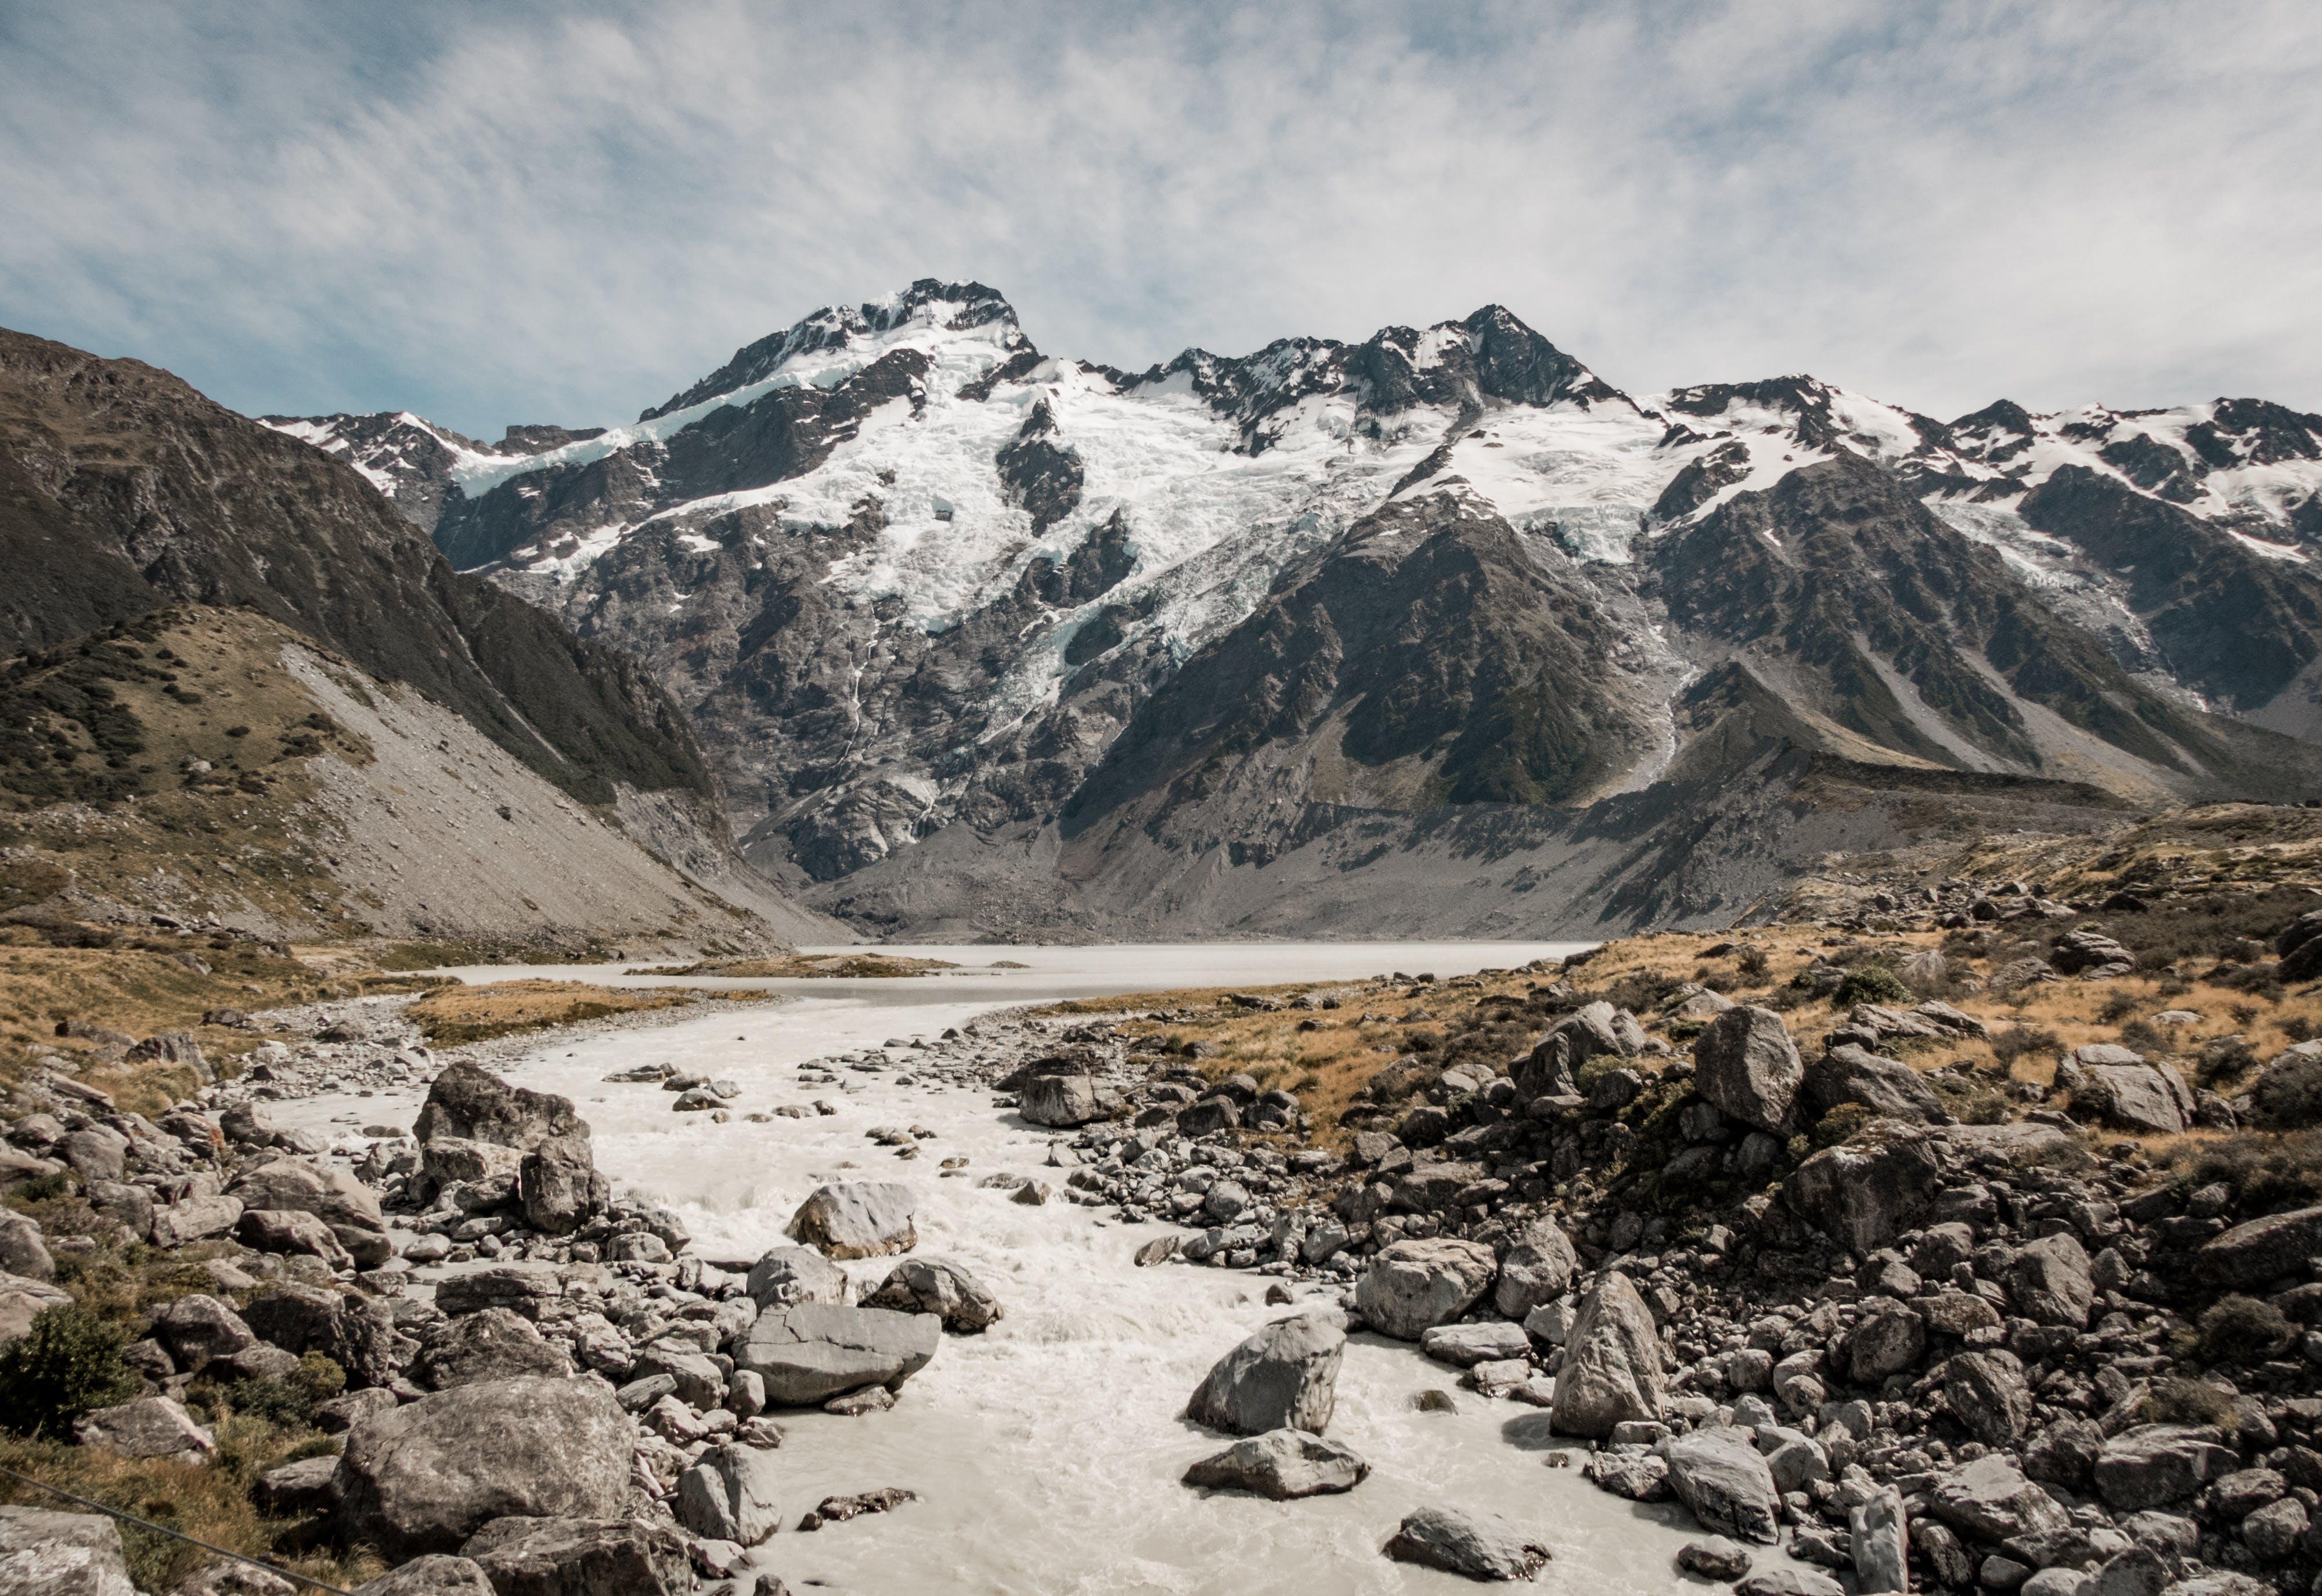 A Pathway Through Ice Like Mountain